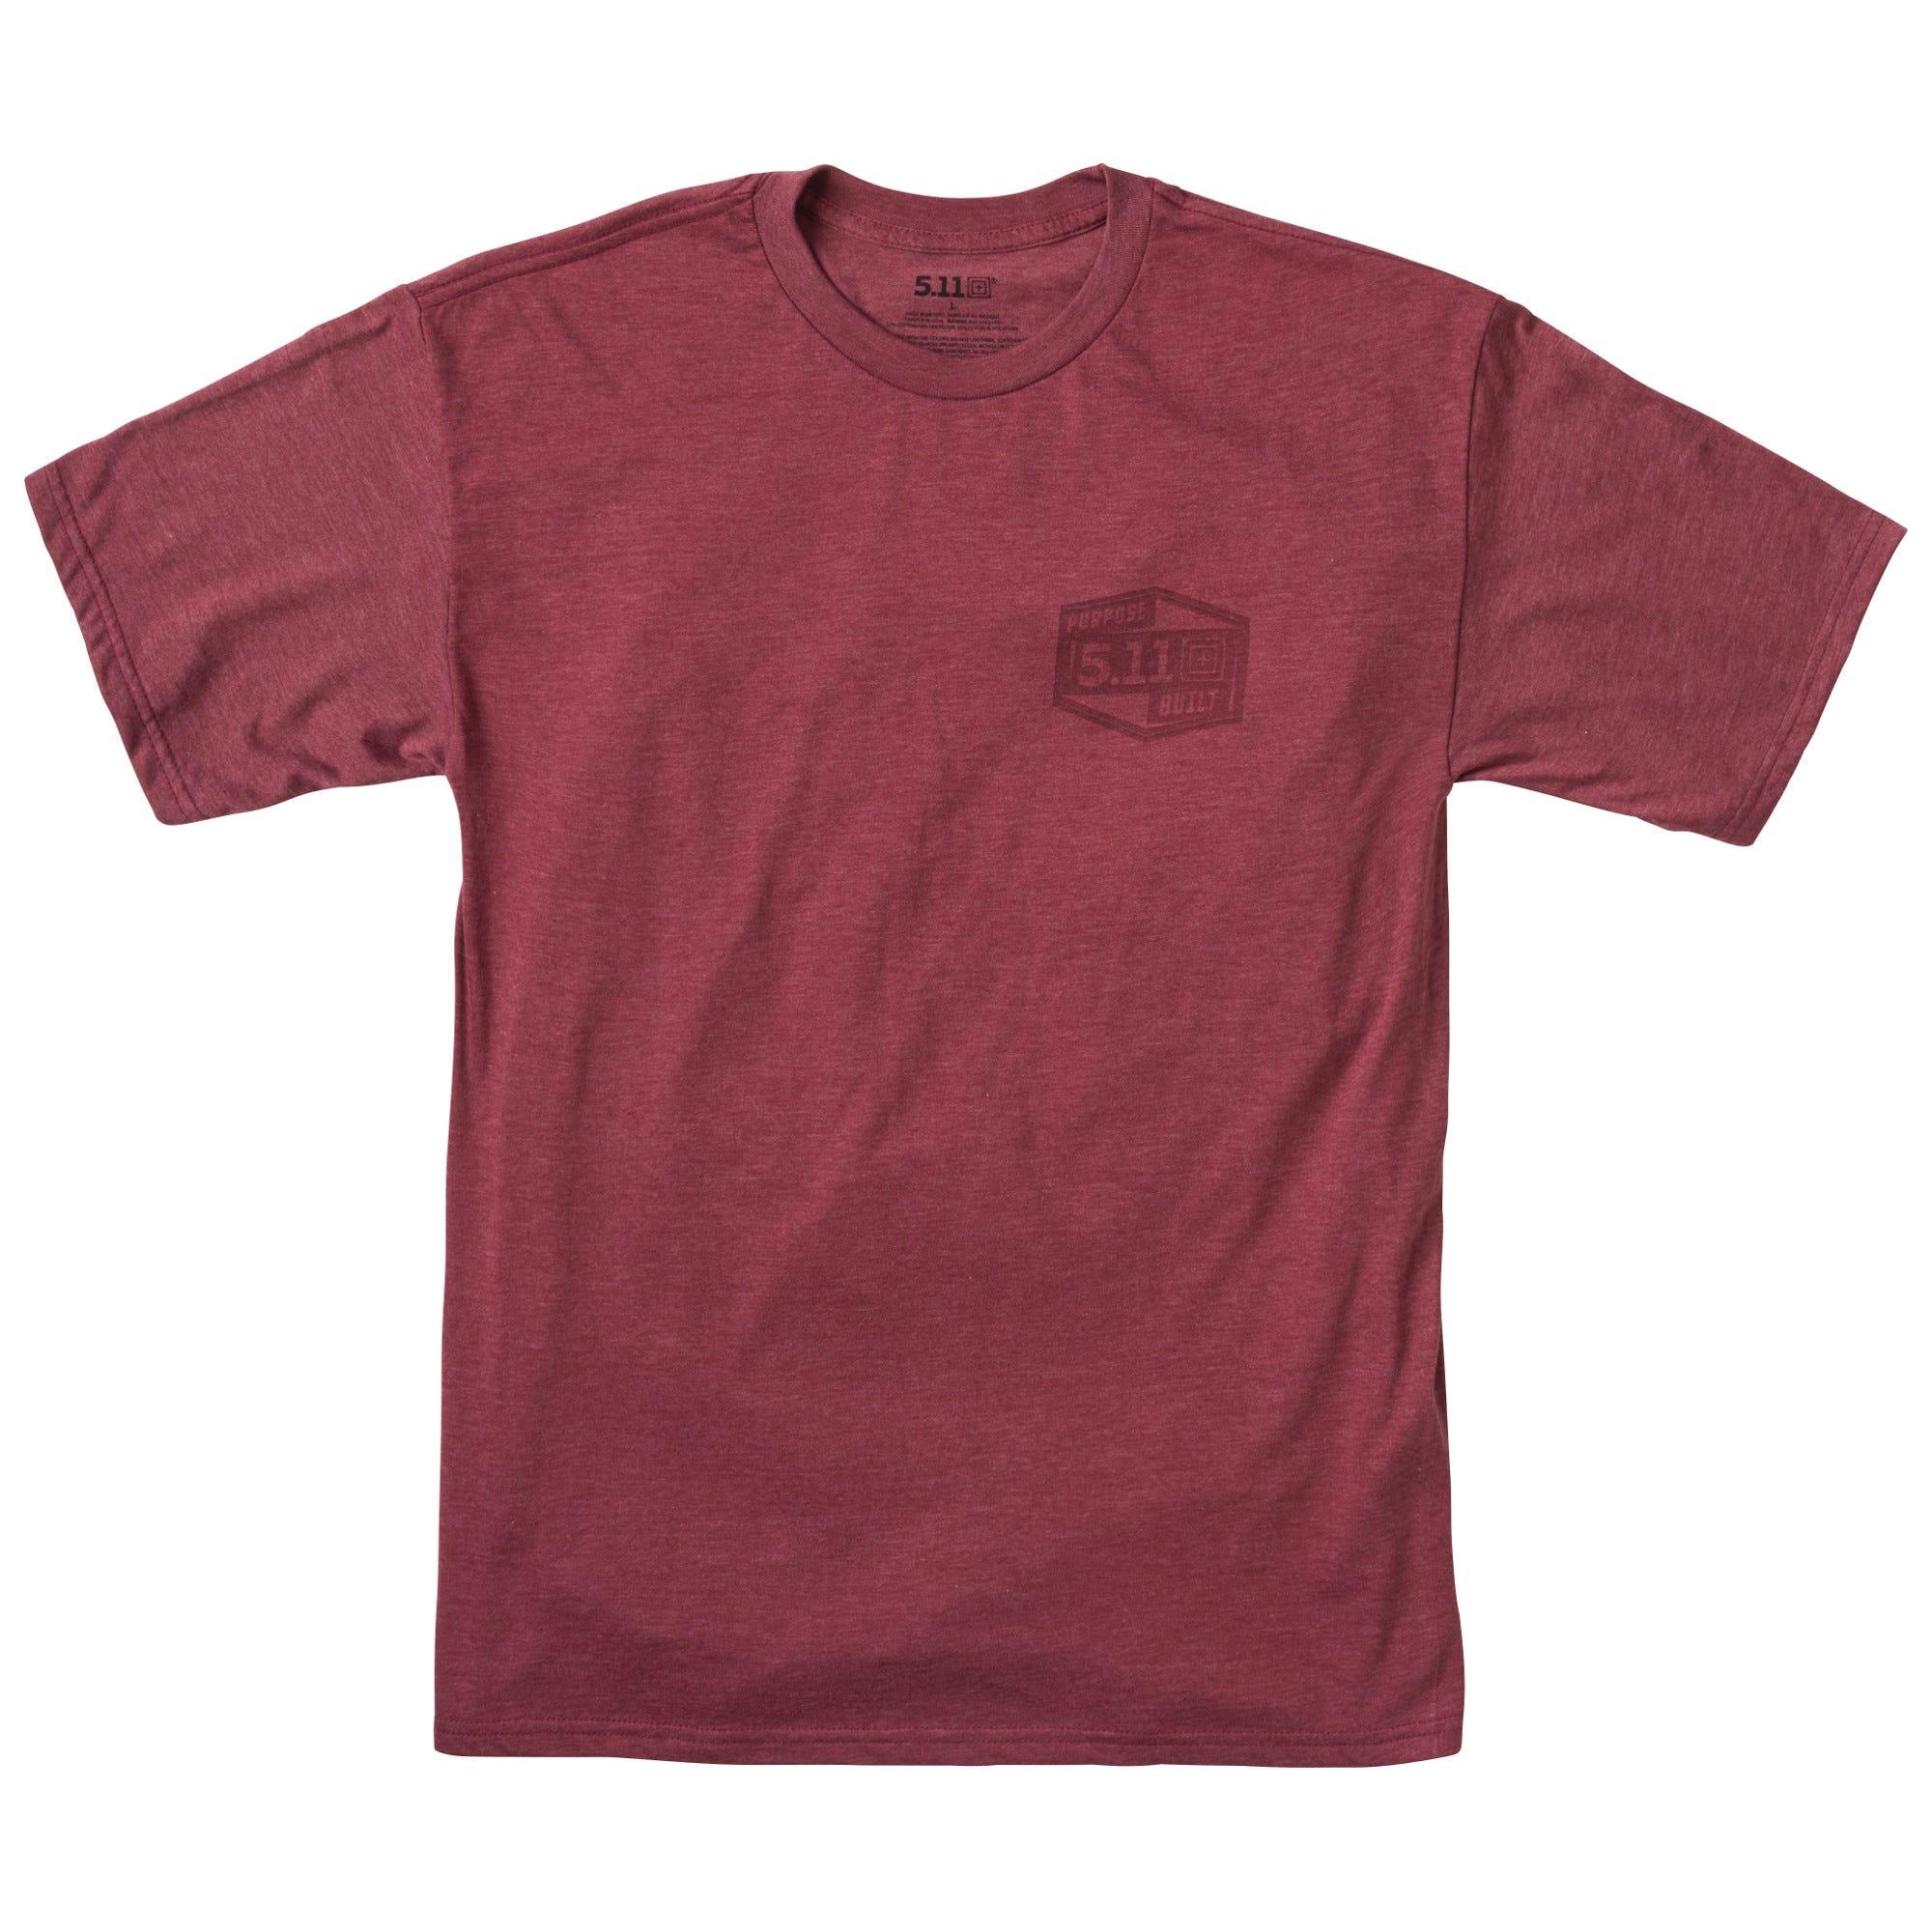 5.11 Tactical Men's Purpose Built Tee (Red)